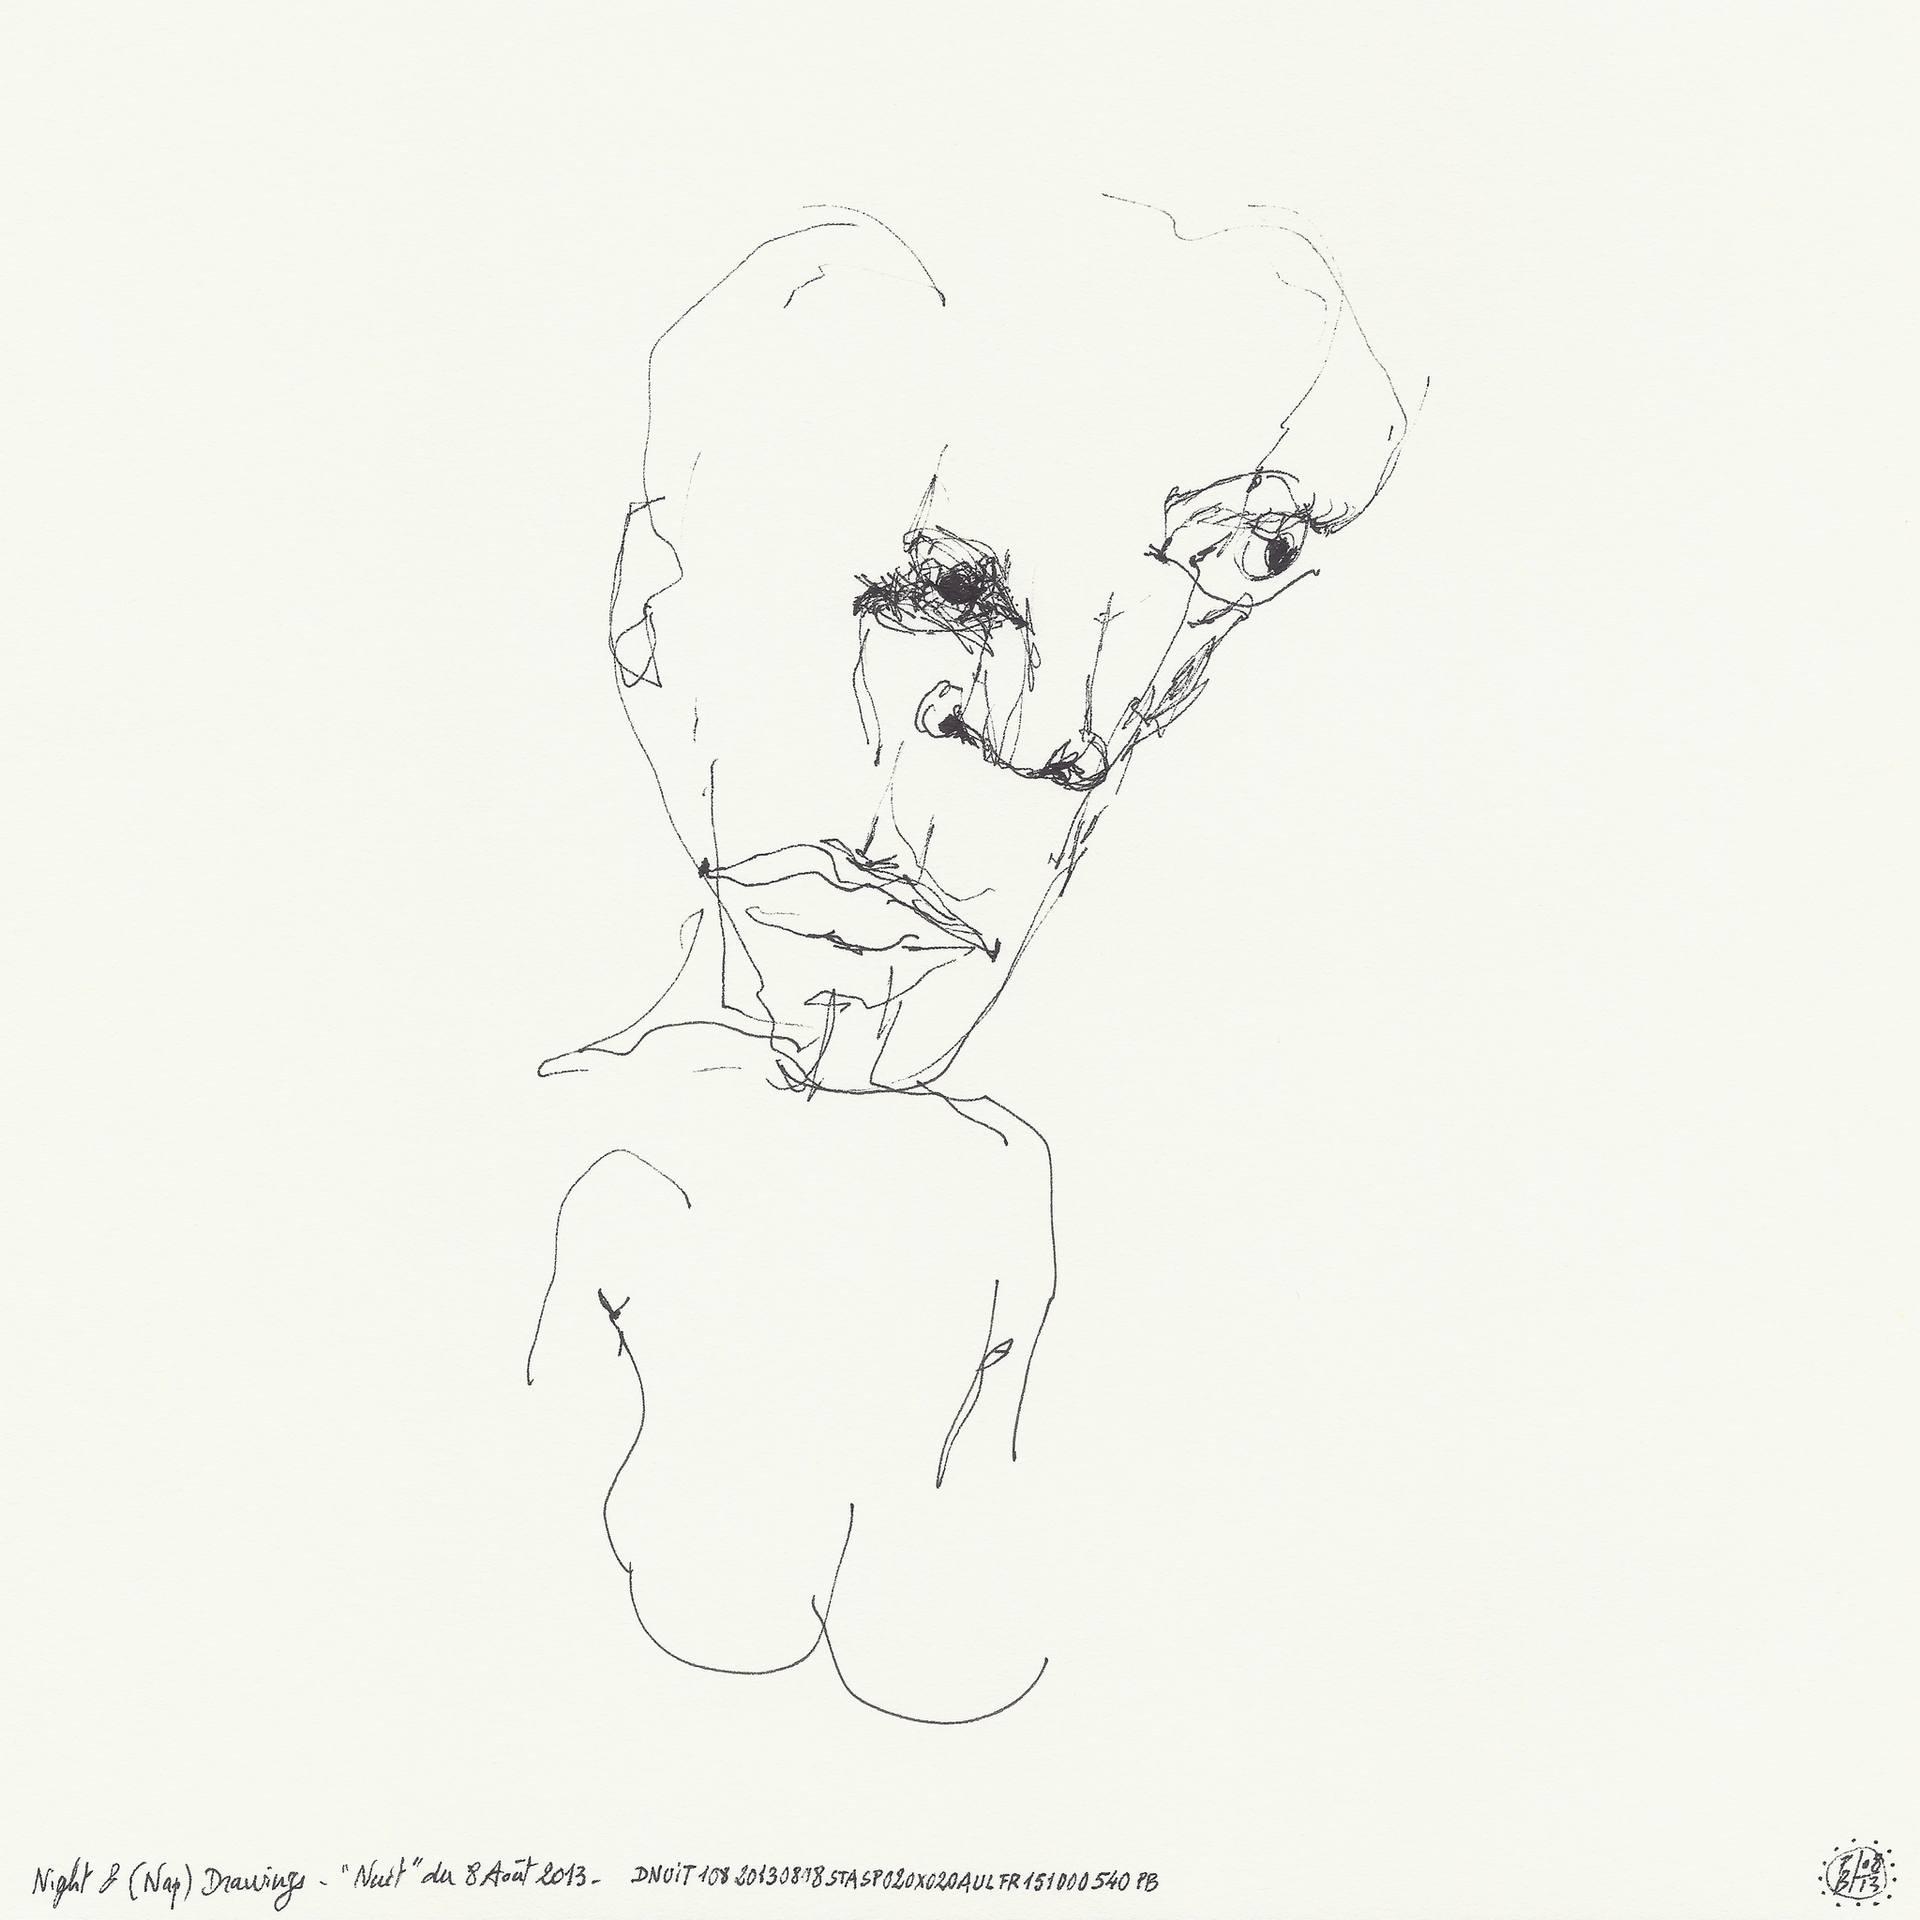 1920x1920 Saatchi Art Night Amp (Nap) Drawings